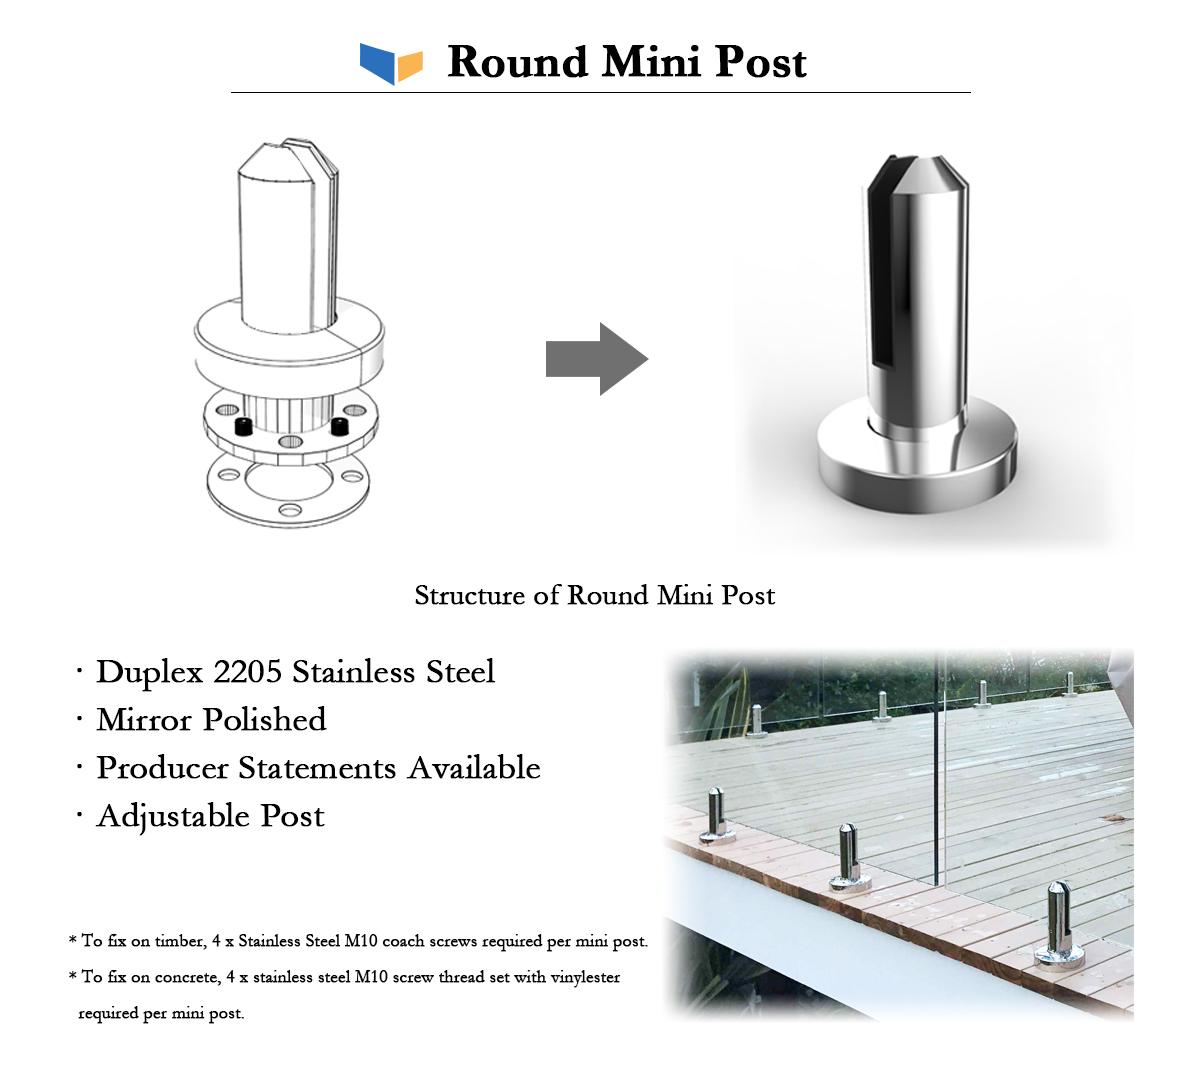 roundminipost-revised.jpg